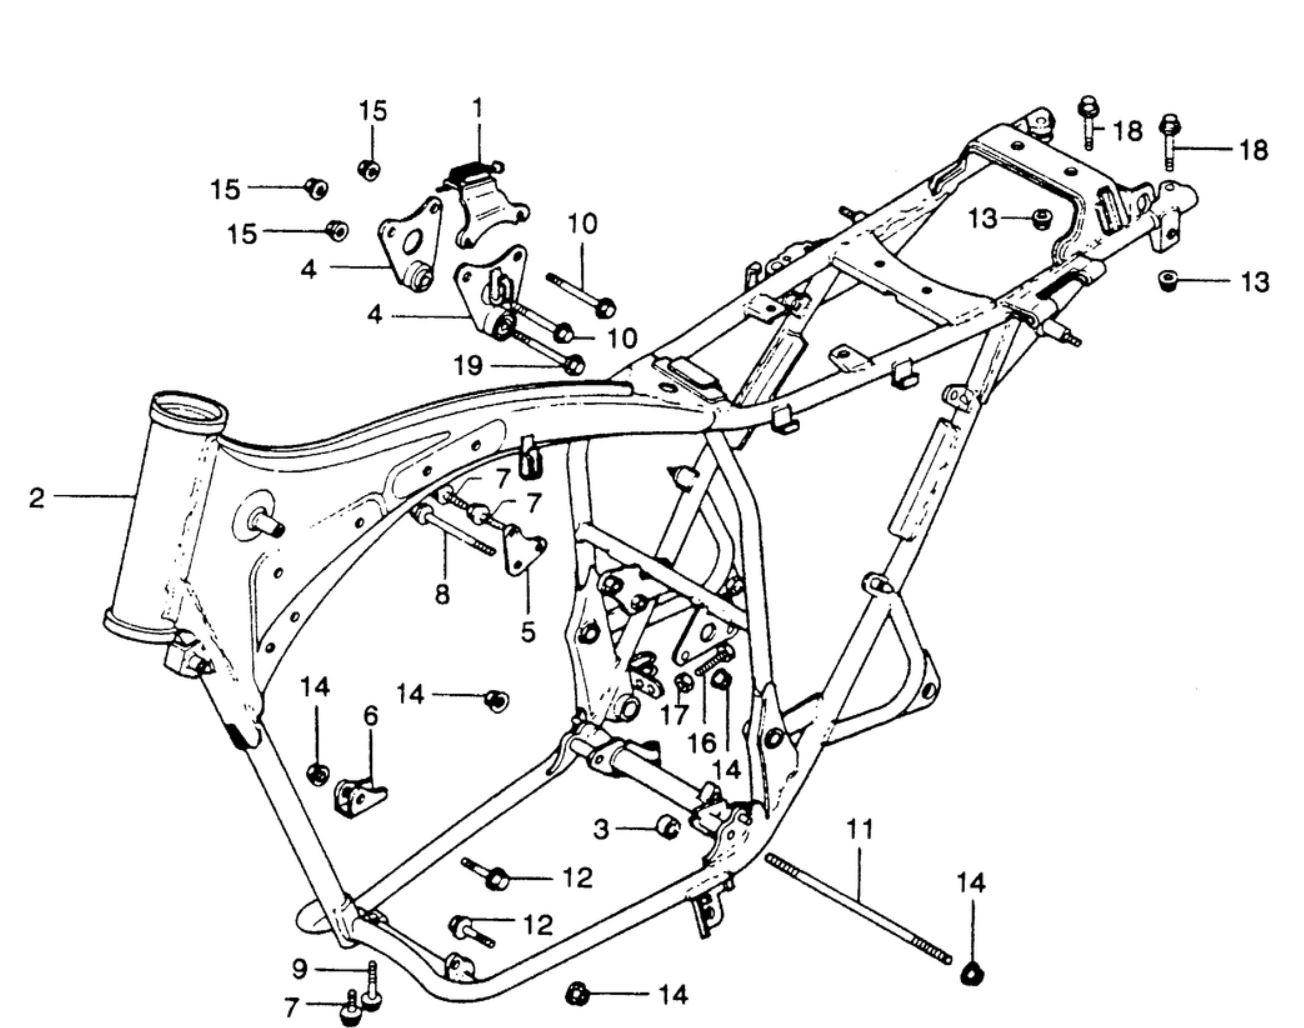 Fantastisch Schaltplan 1975 Honda Cb360 Ideen - Elektrische ...